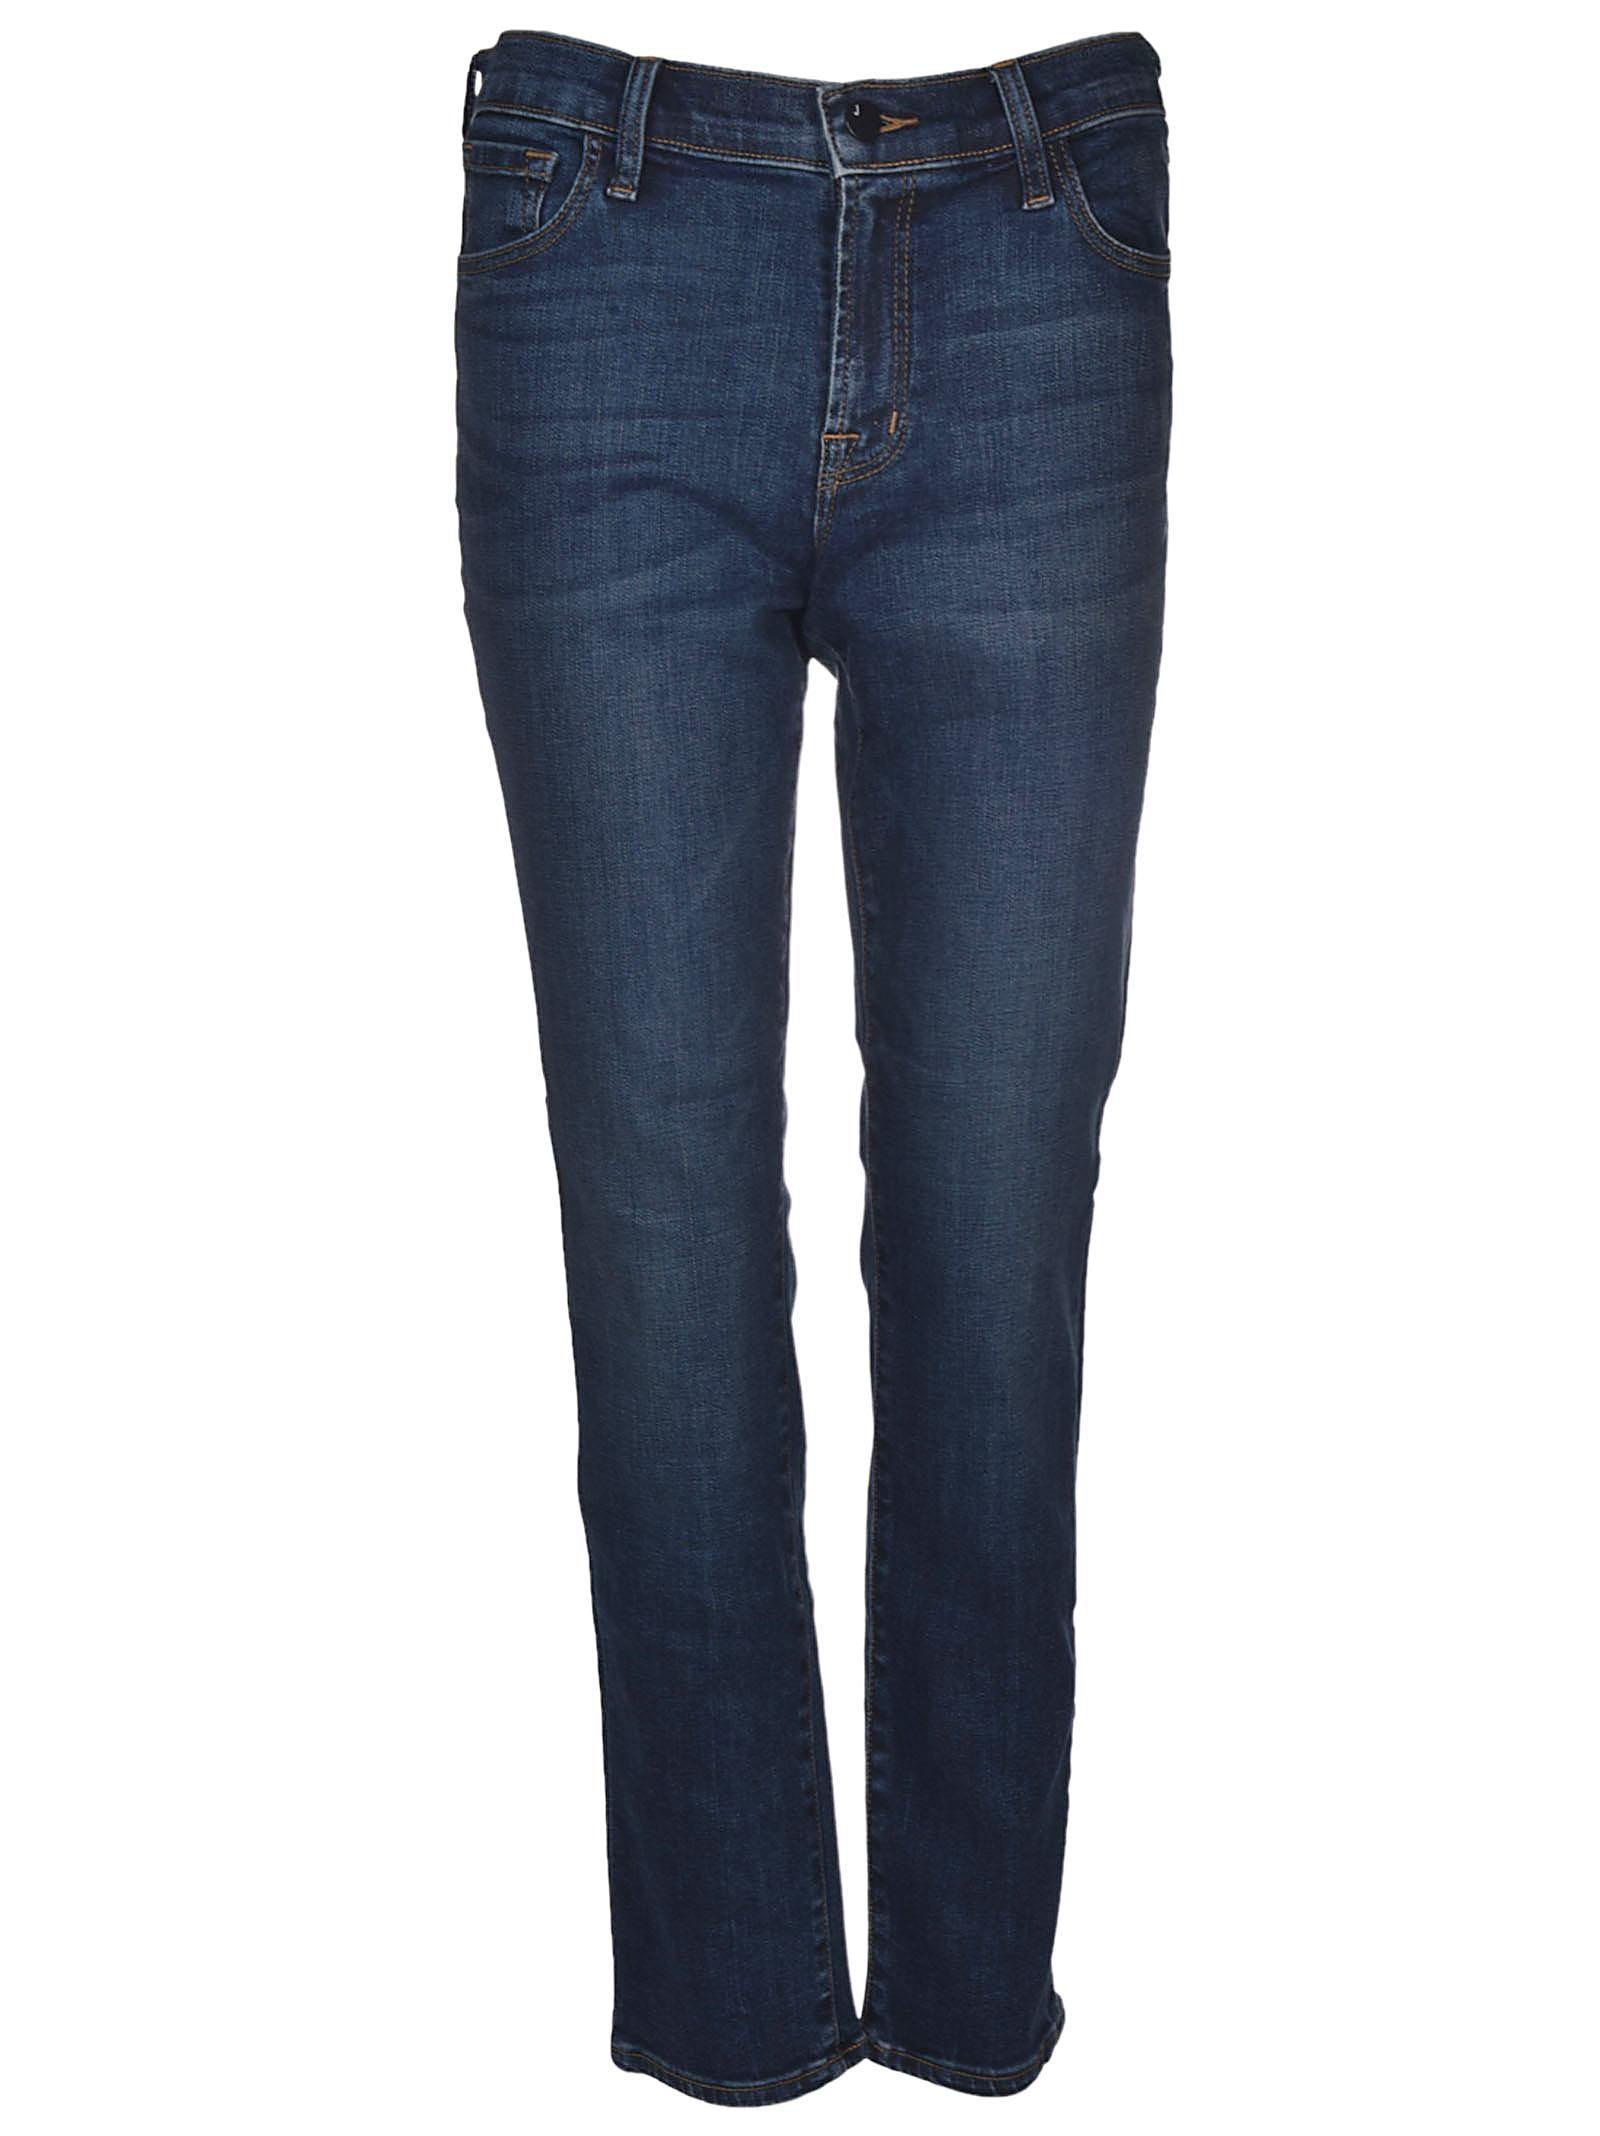 j brand j brand mid rise cigarette jeans blu women 39 s jeans italist. Black Bedroom Furniture Sets. Home Design Ideas